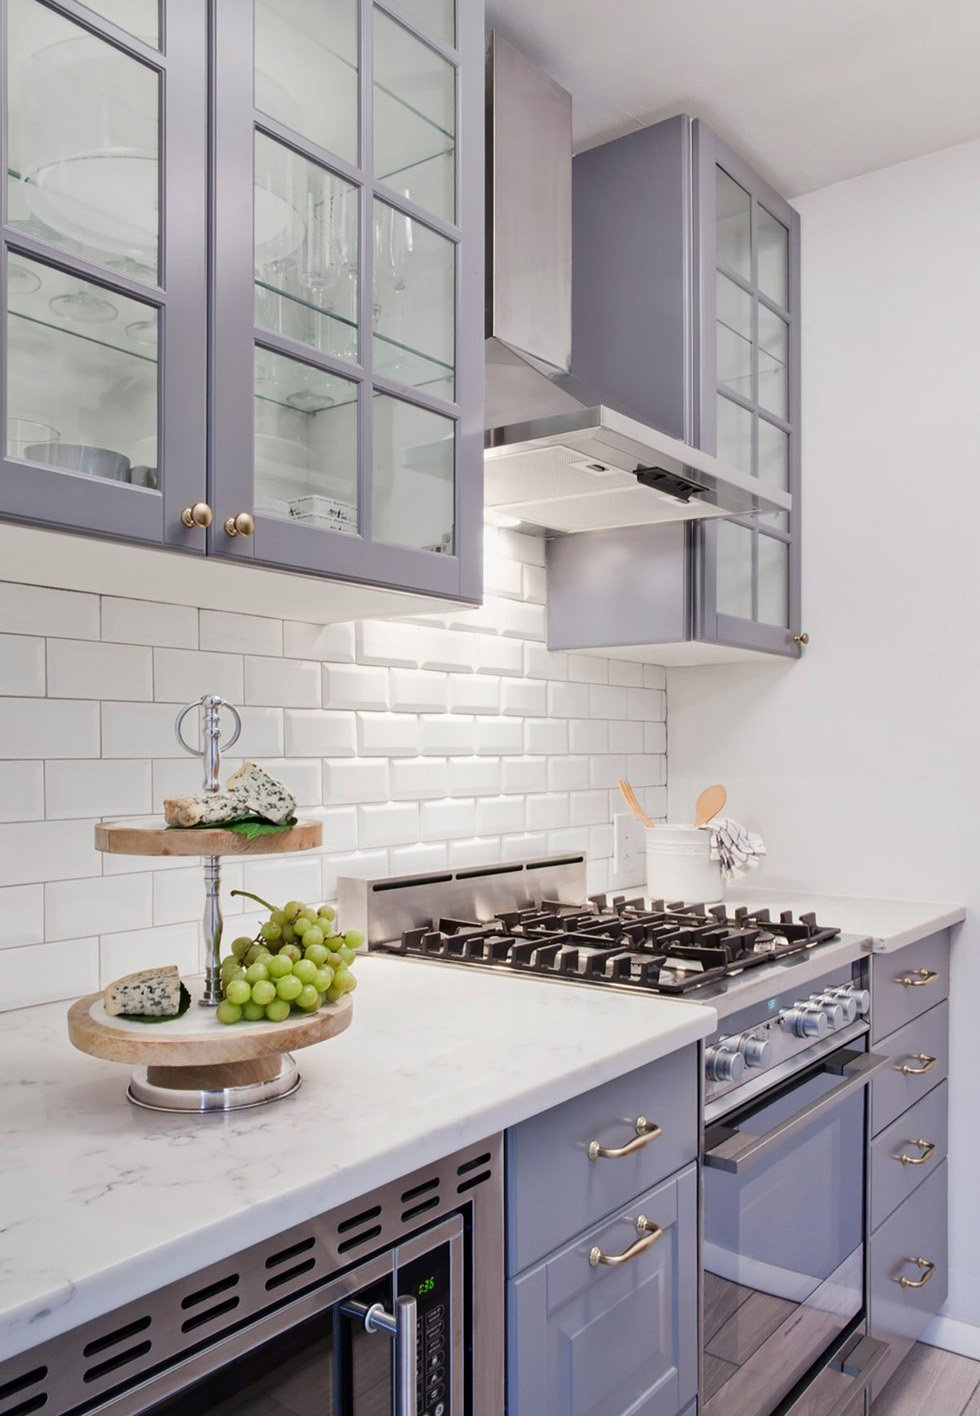 Kitchen Inspiration 6